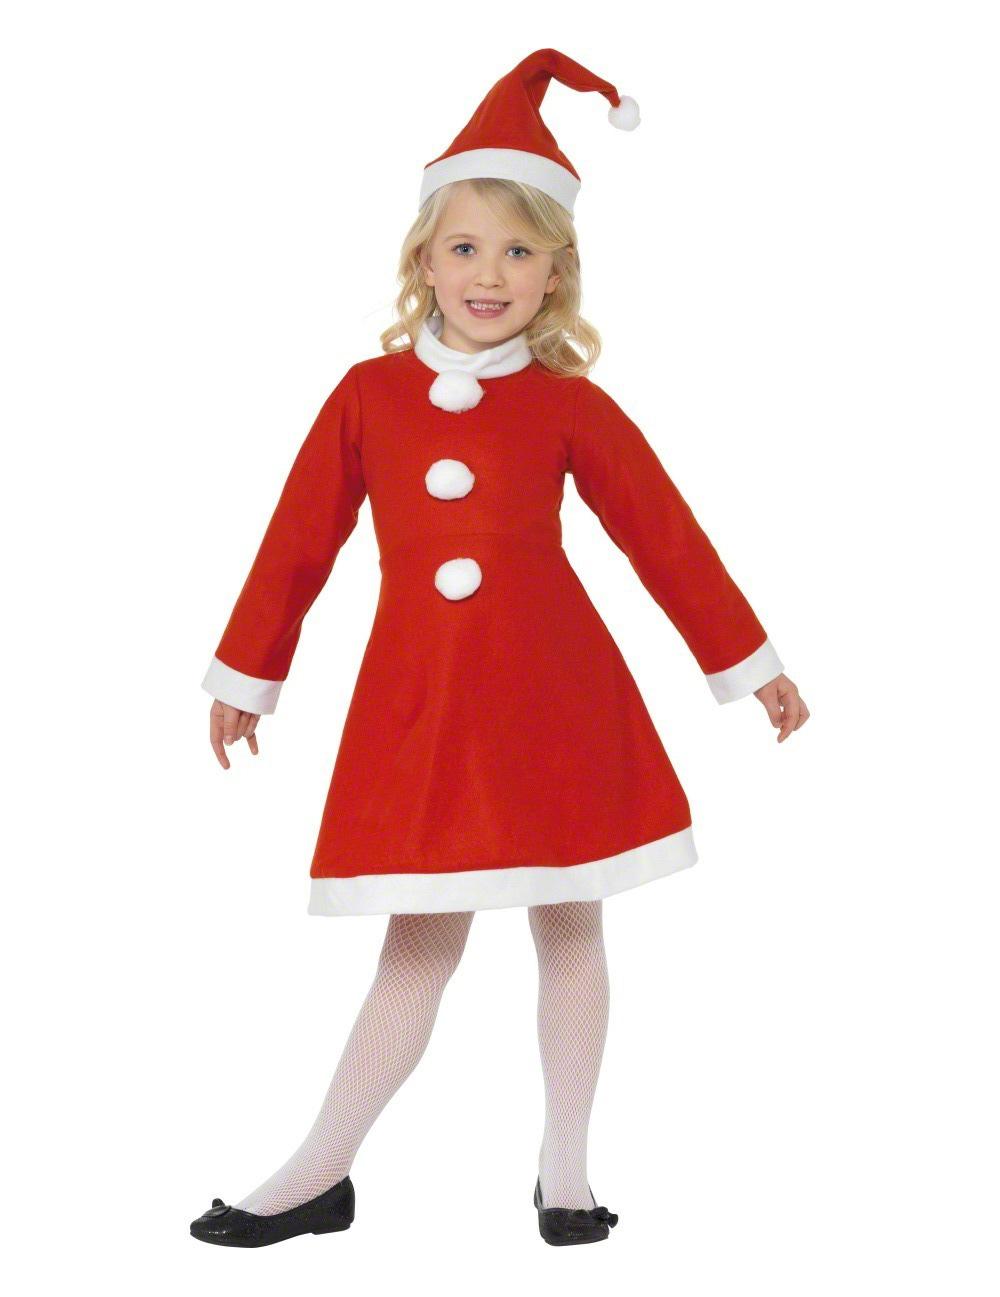 2baad57d74af5 Déguisement Mère Noël robe pompons fille   Deguise-toi